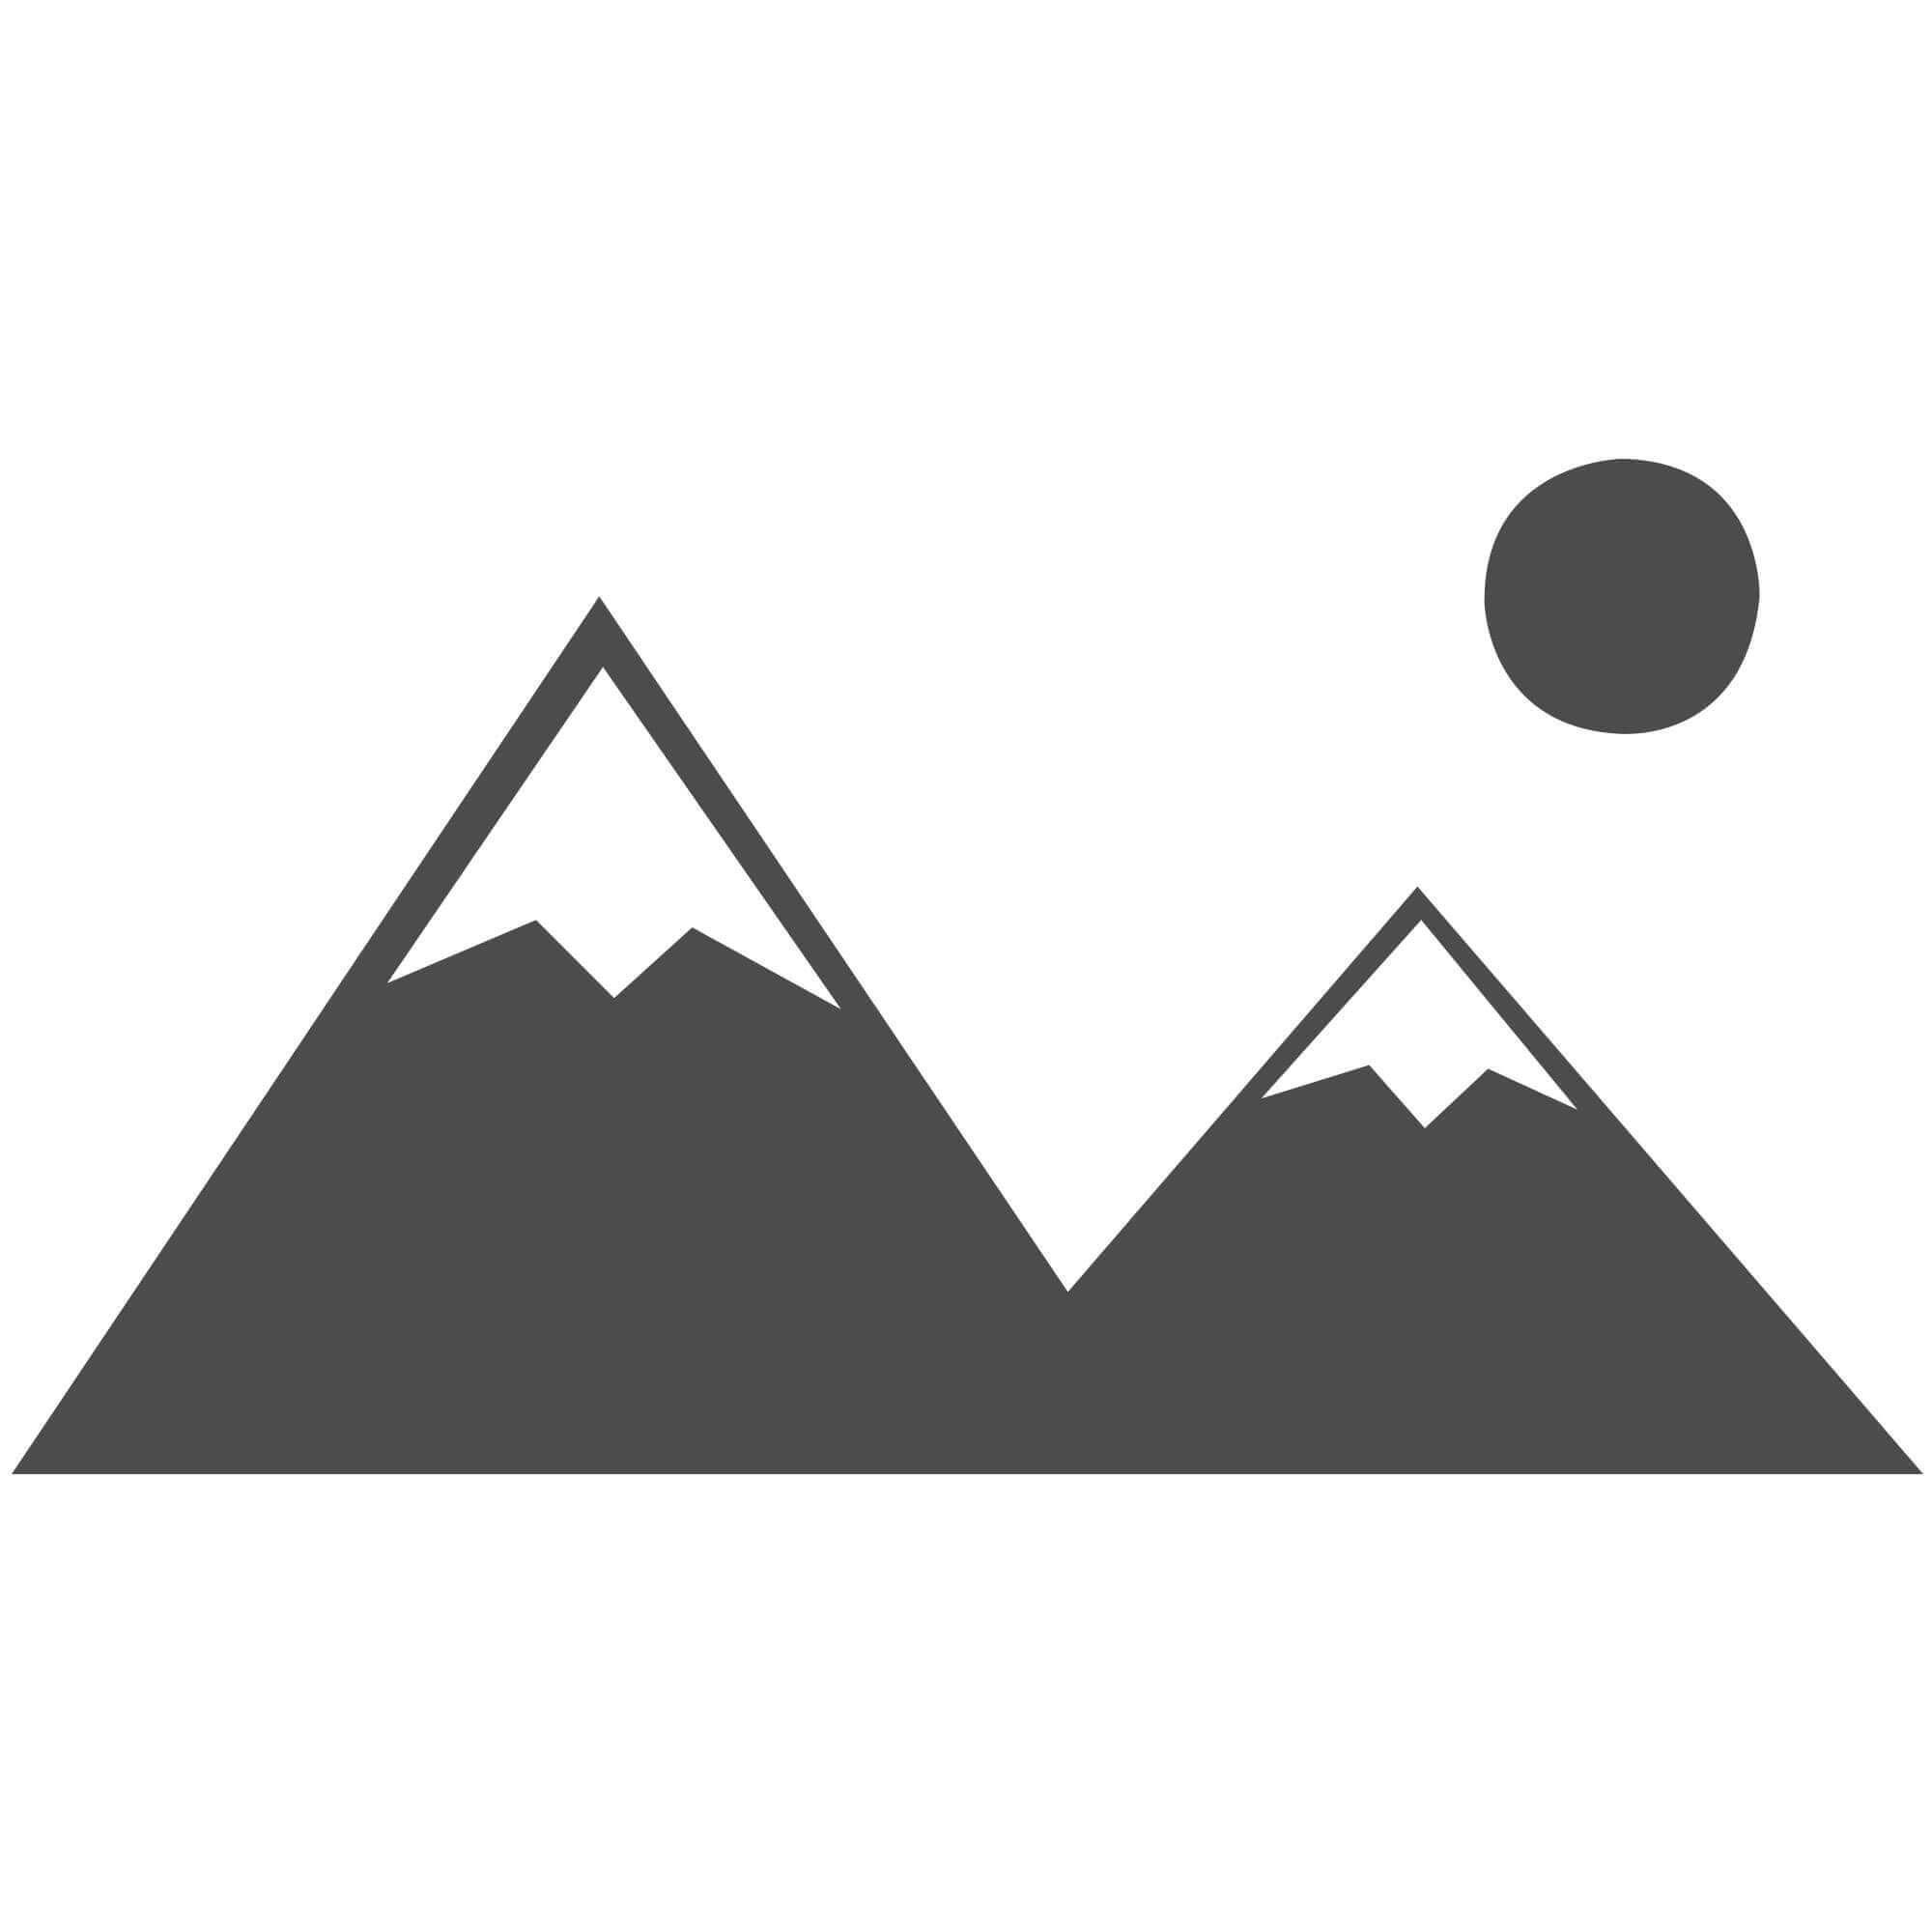 RHINO HEX 45 Adjustable Cross Bar Bracket